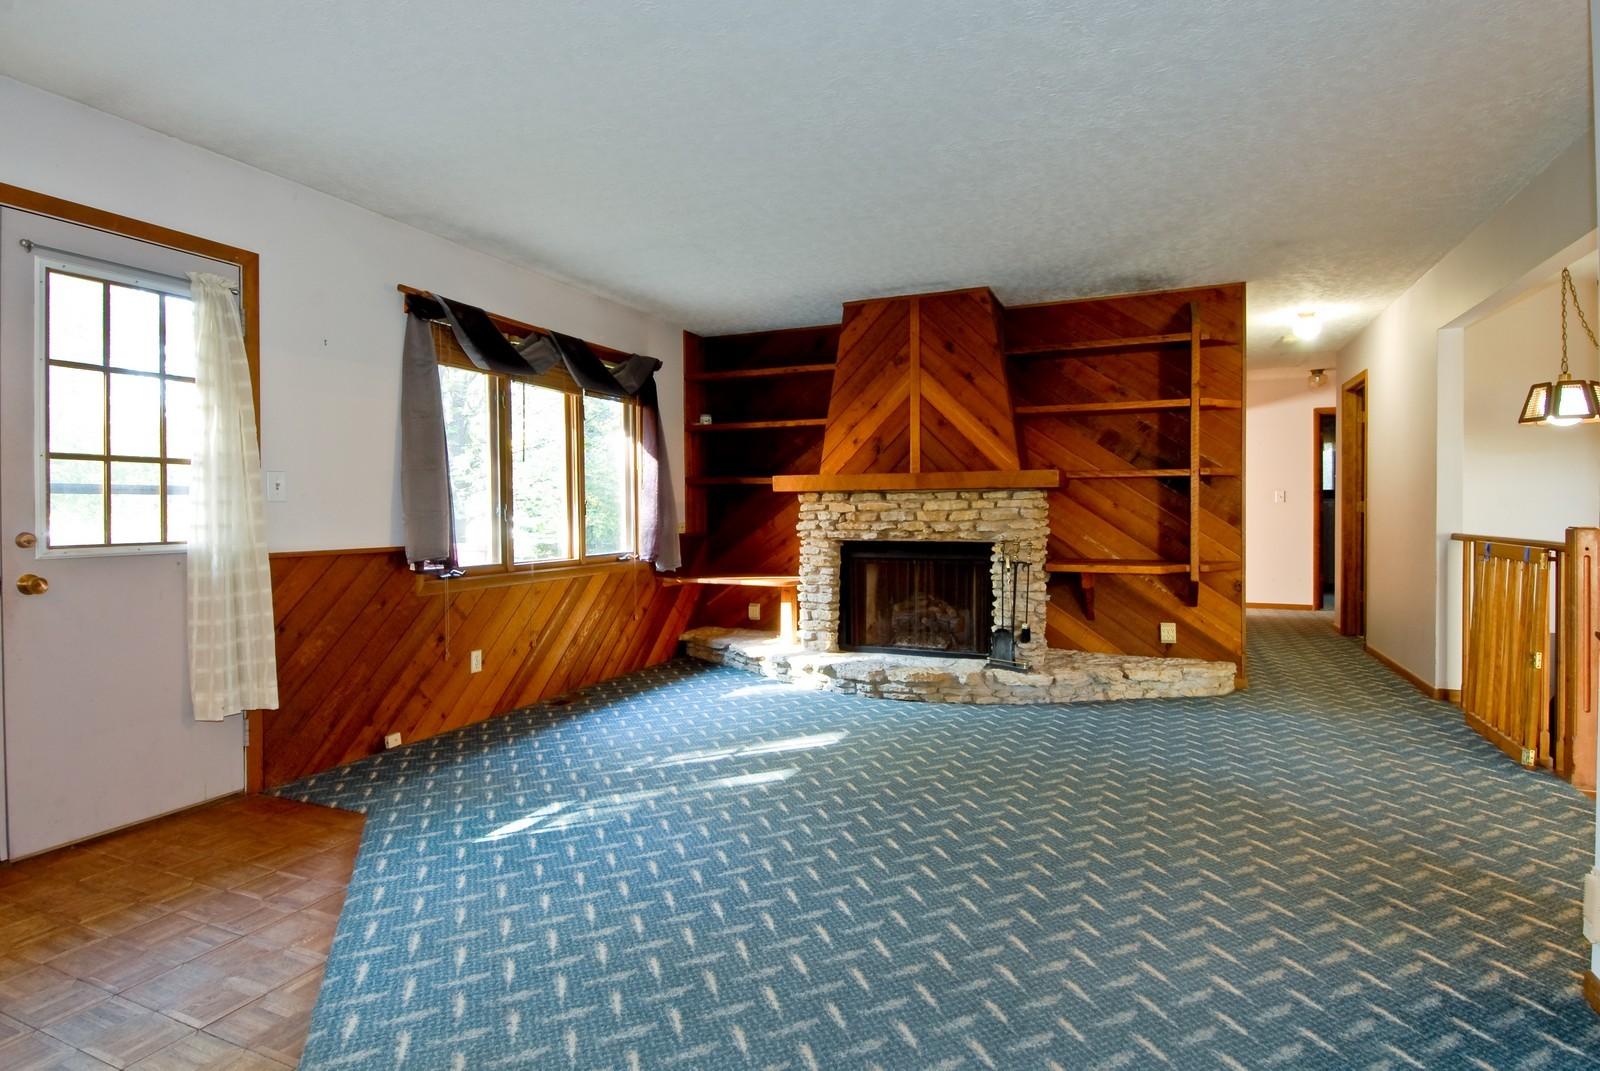 Real Estate Photography - 625 Konen Ave, Aurora, IL, 60505 - Family Room